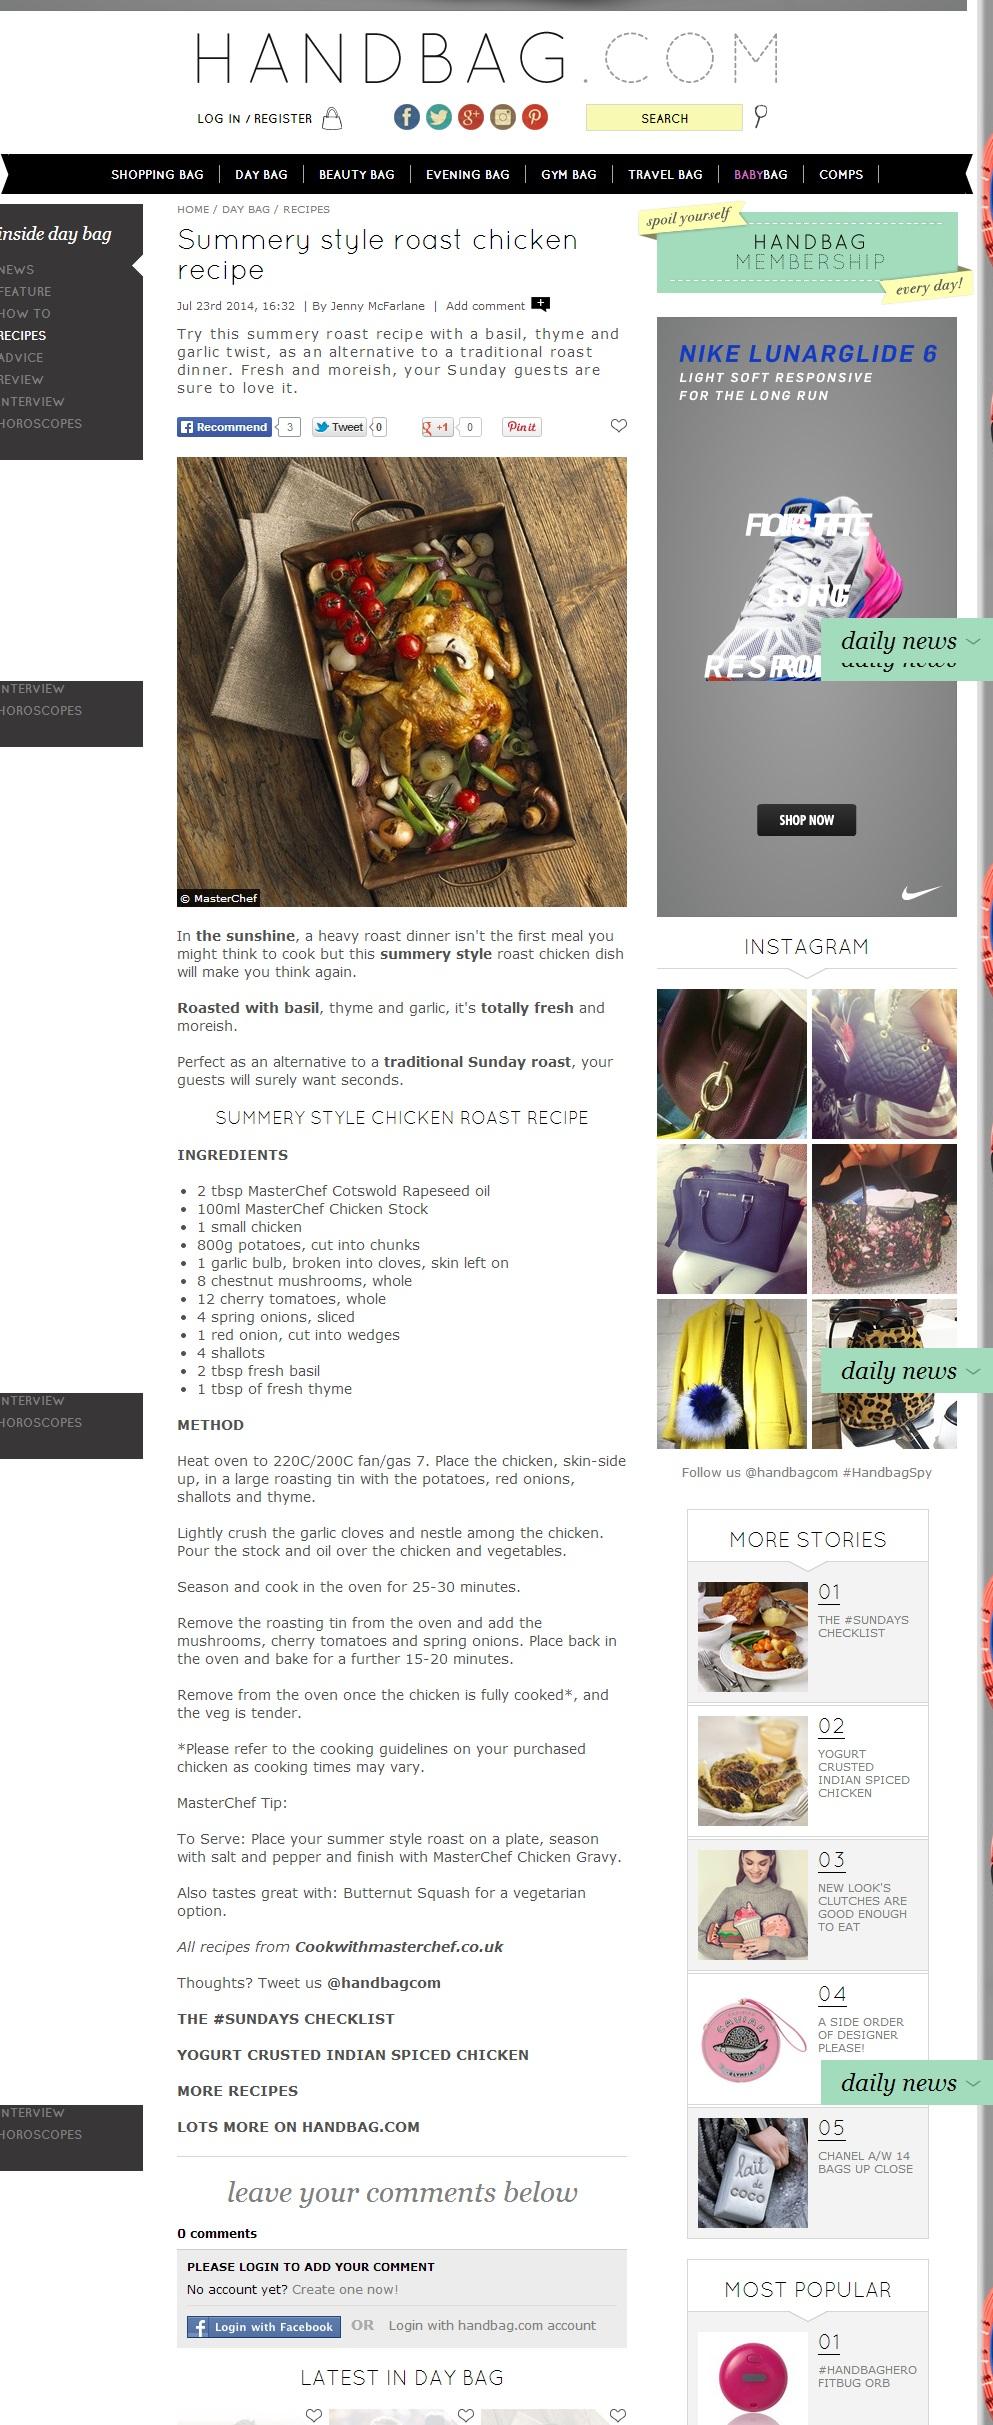 screencapture-www-handbag-com-day-bag-recipes-a586020-summery-style-roast-chicken-recipe-html